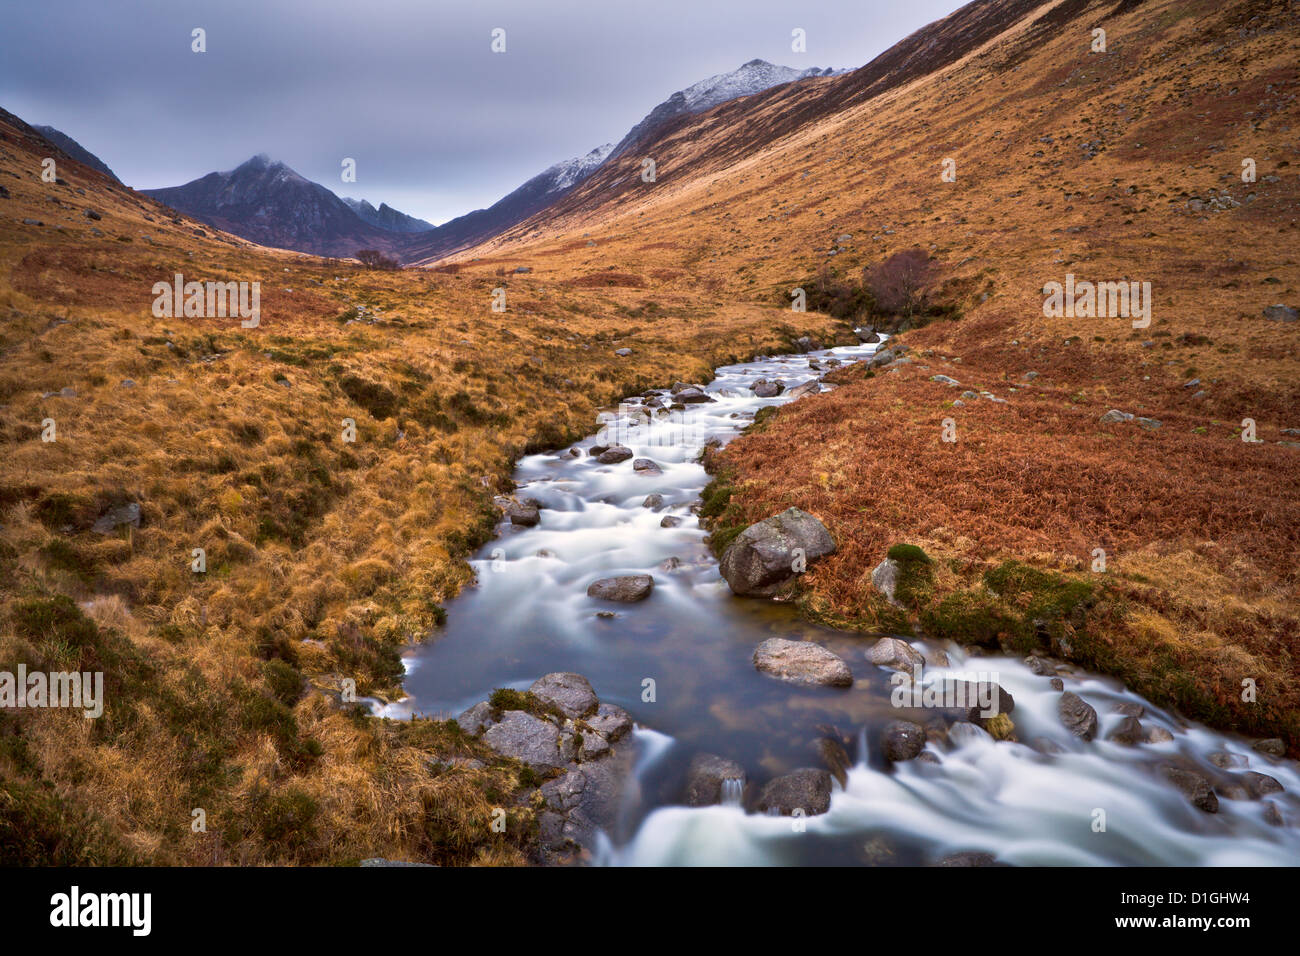 Glen Rosa Water, with Cir Mhor and Goat Fell peaks ahead, Isle of Arran, Scotland, United Kingdom, Europe - Stock Image